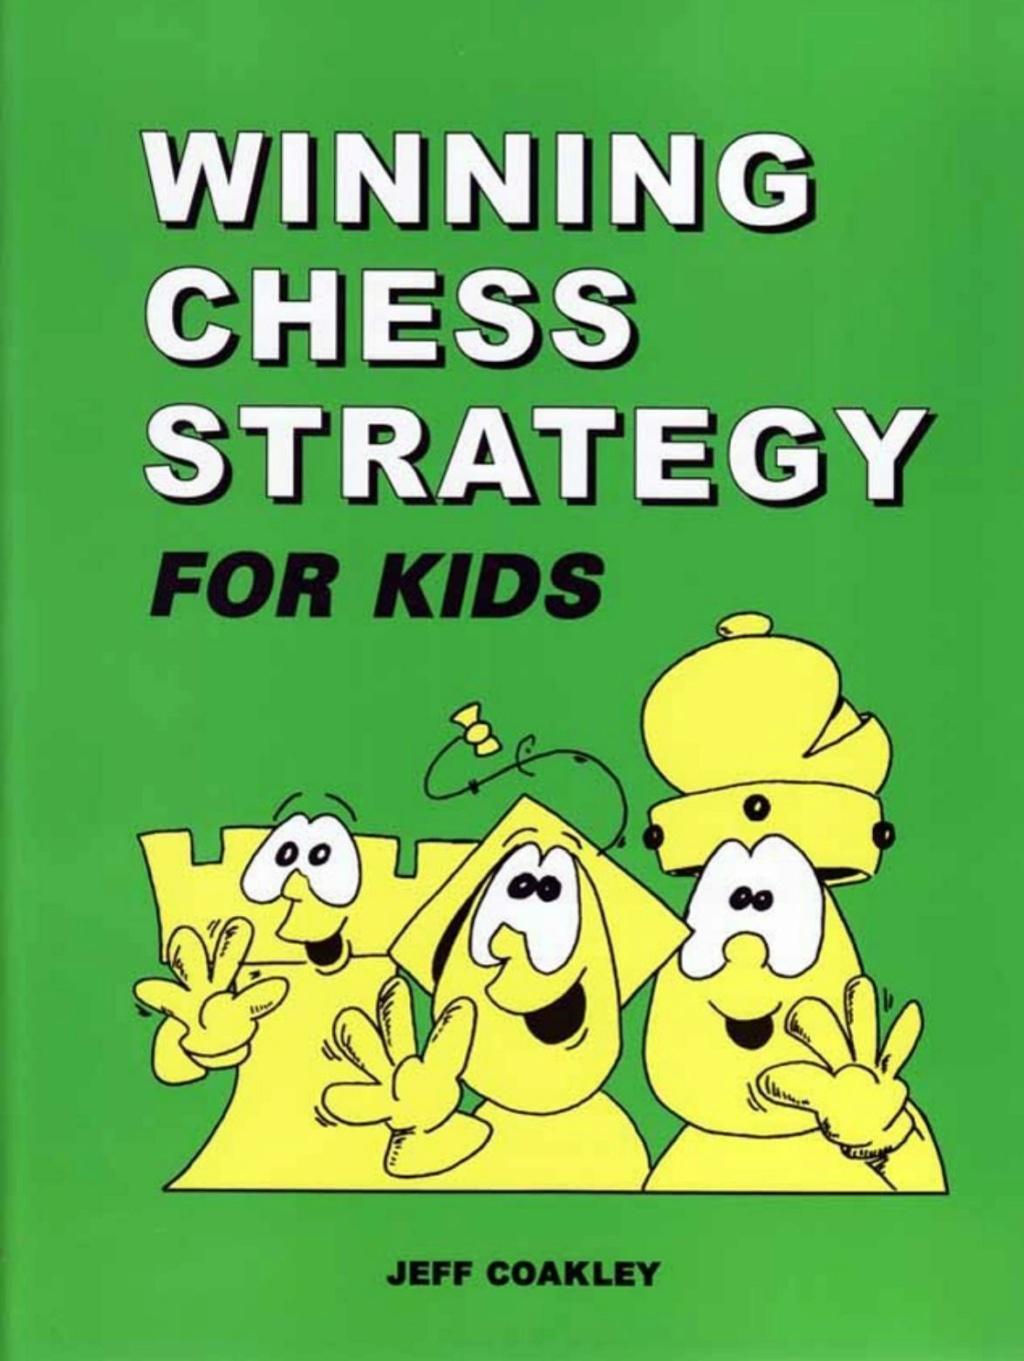 Winning Chess Strategy for Kids - Jeff Coakley Wcs10